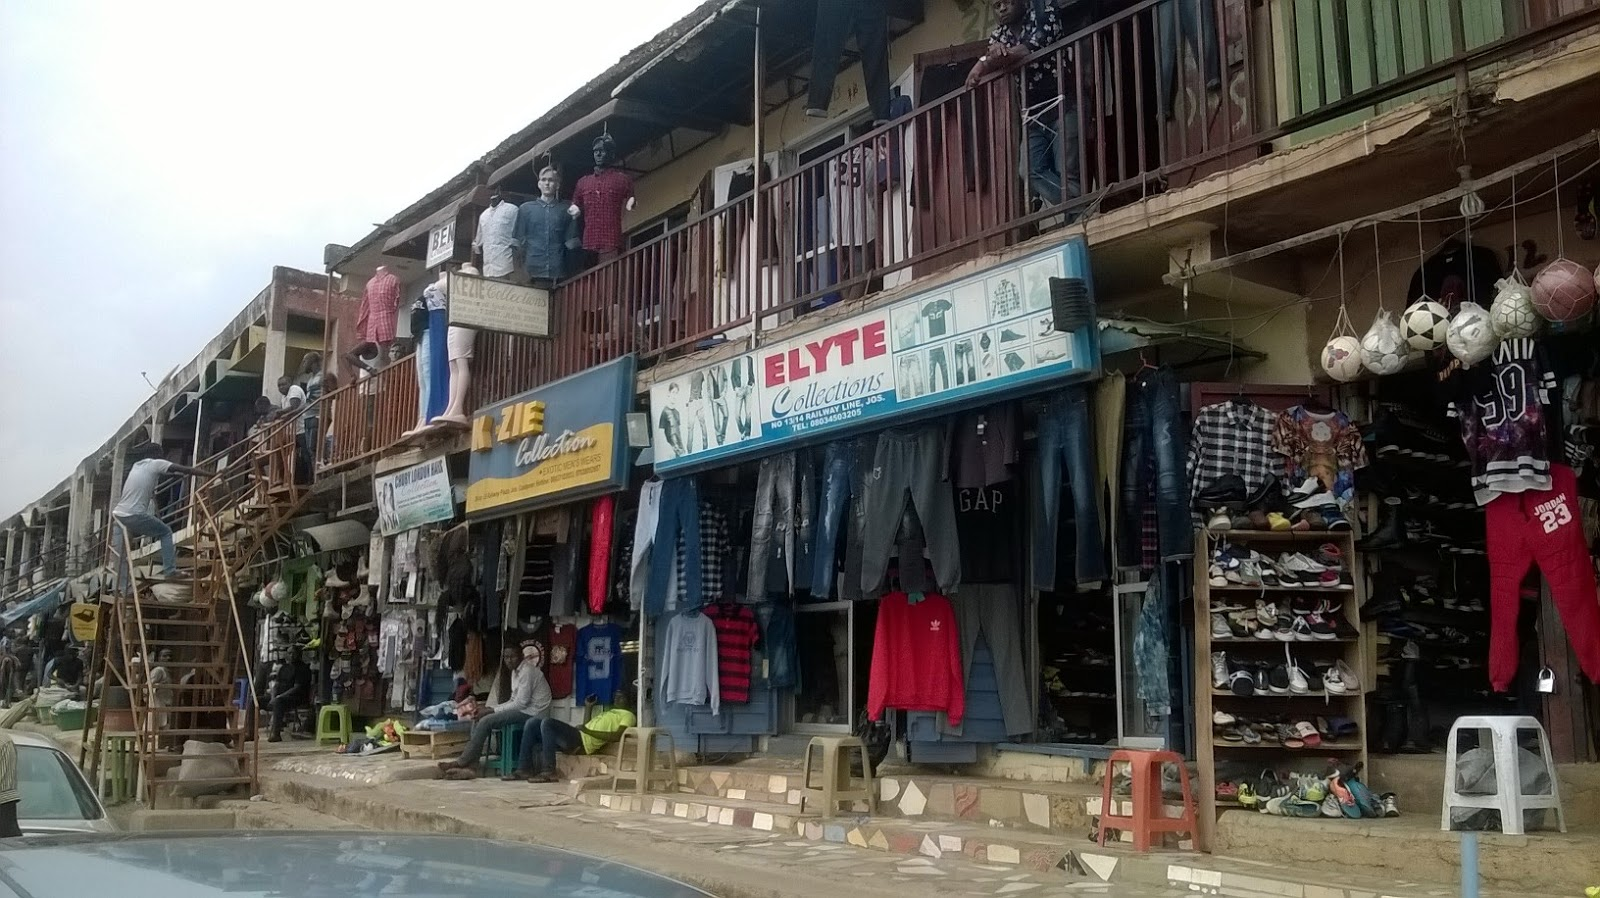 J Town Explore: 7 Most Popular Markets In Jos